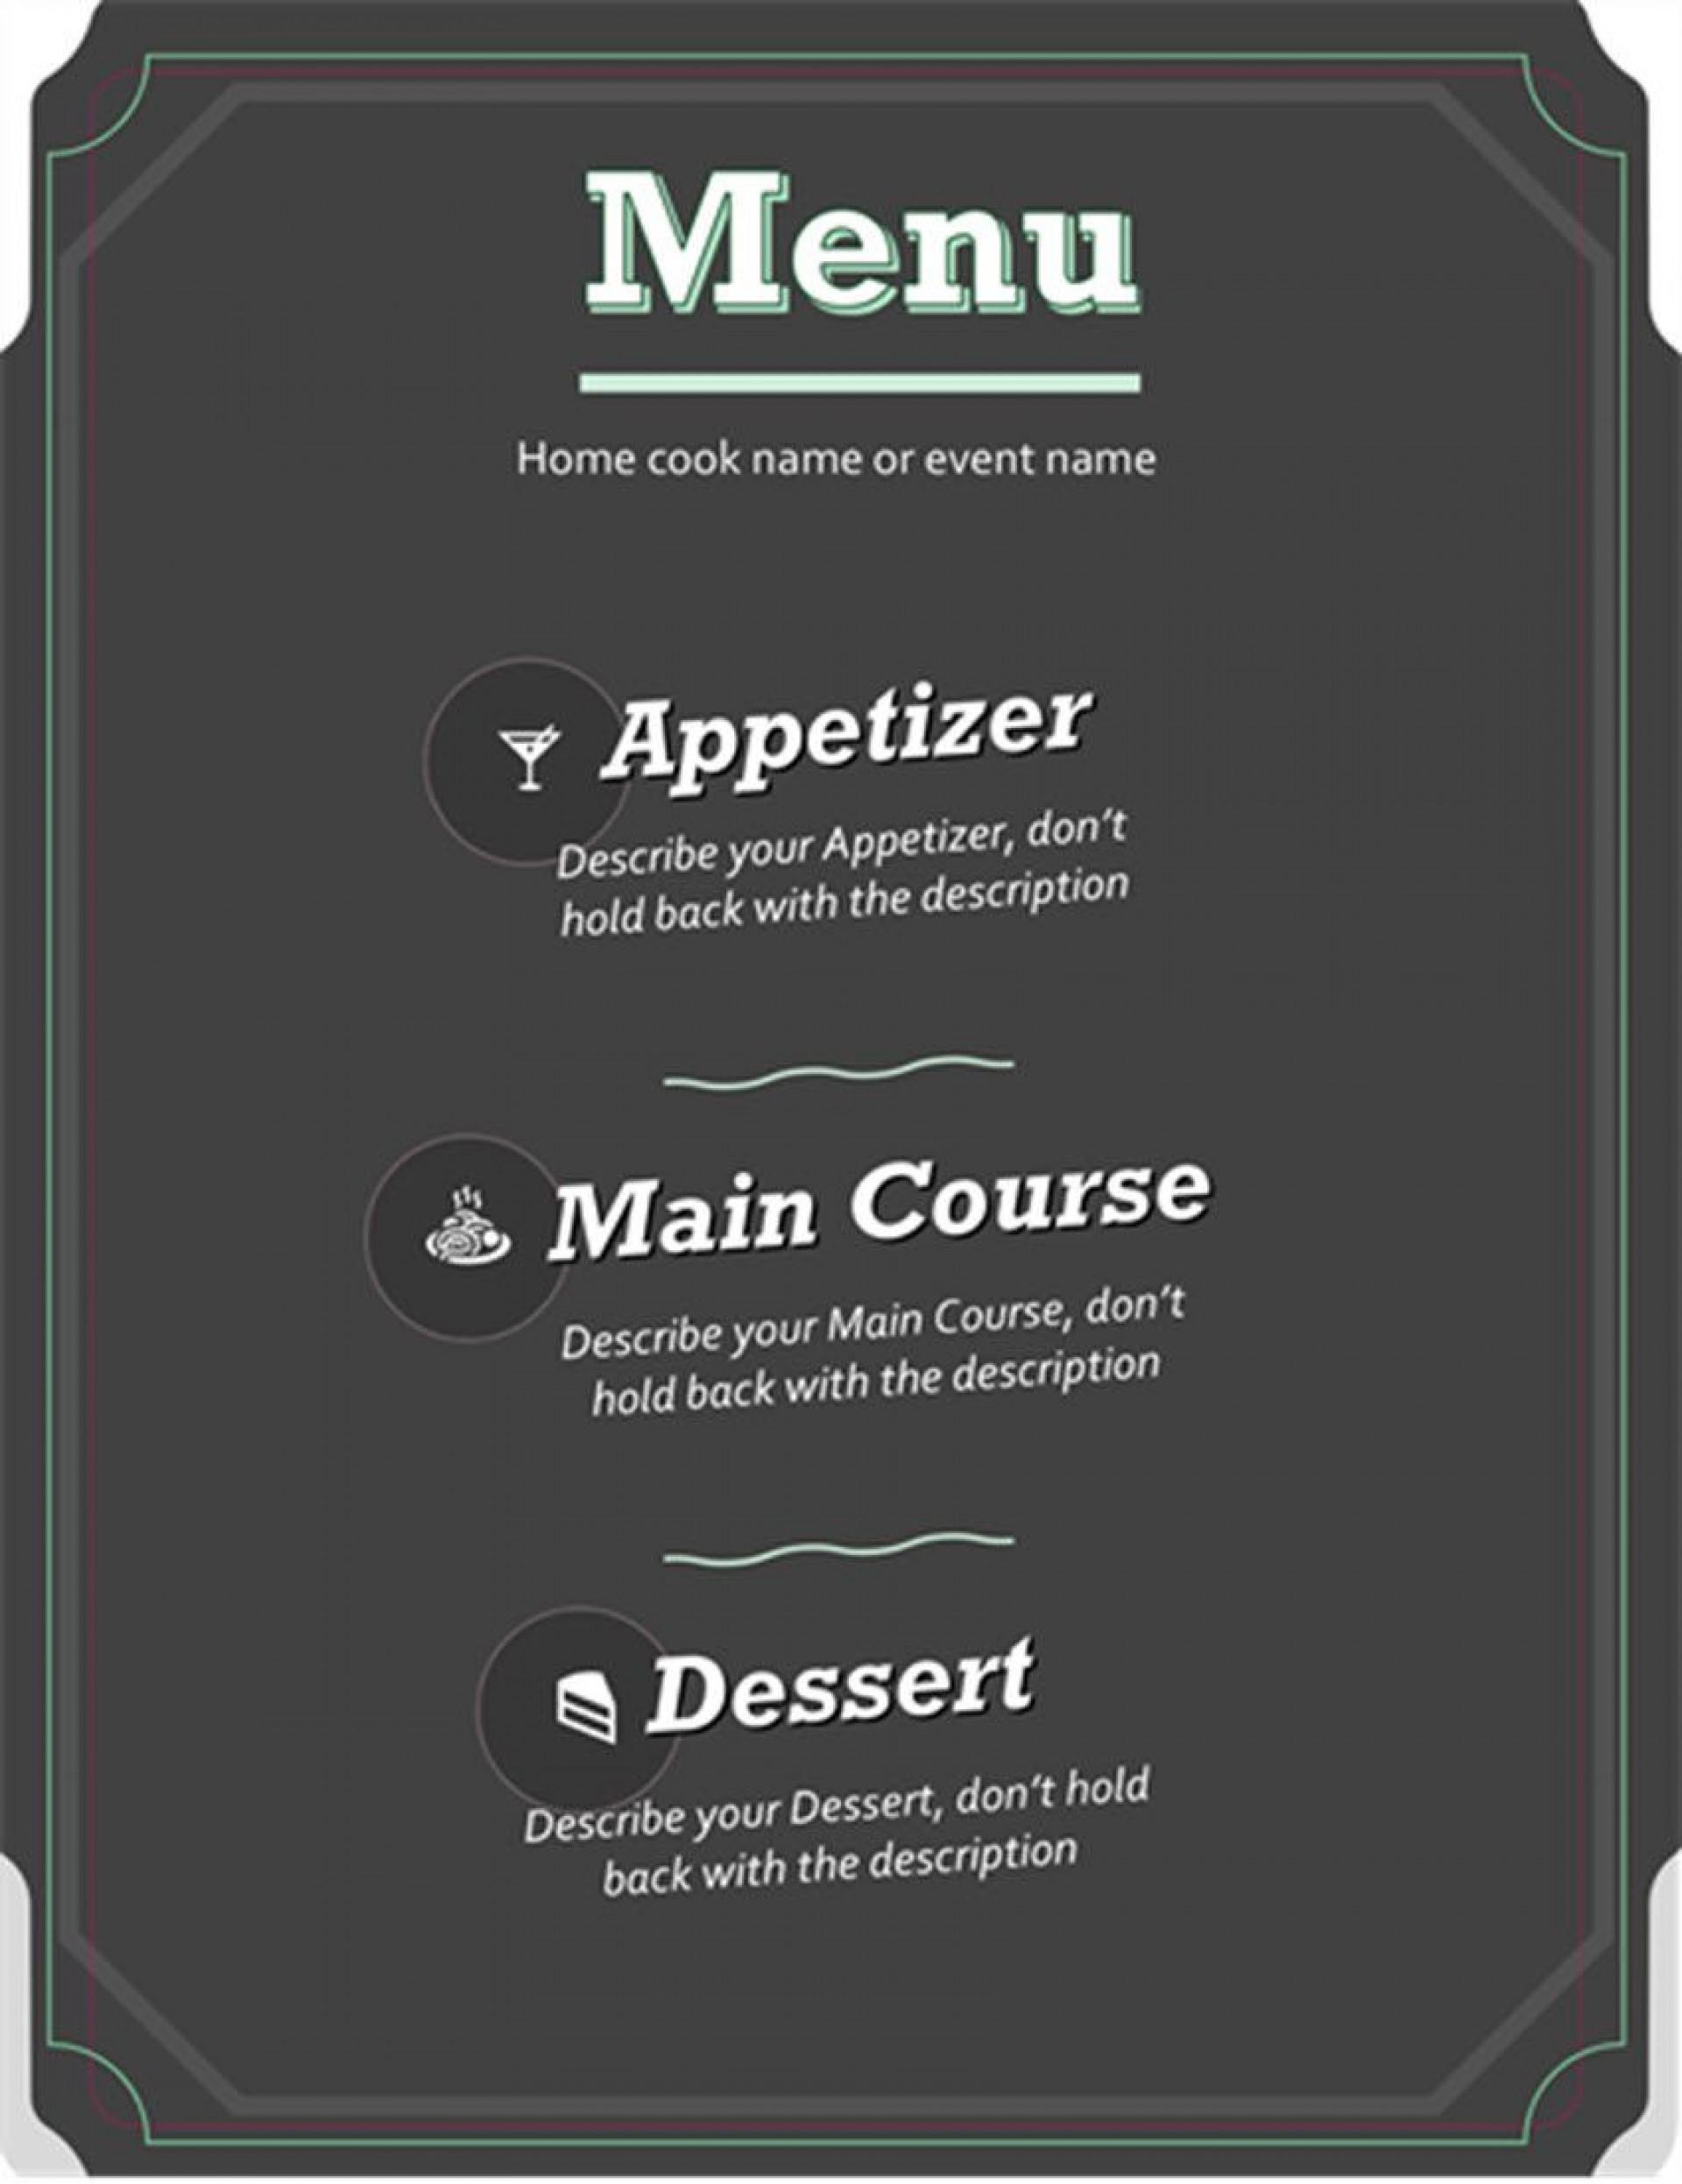 001 Imposing Restaurant Menu Template Free Download Idea 1920